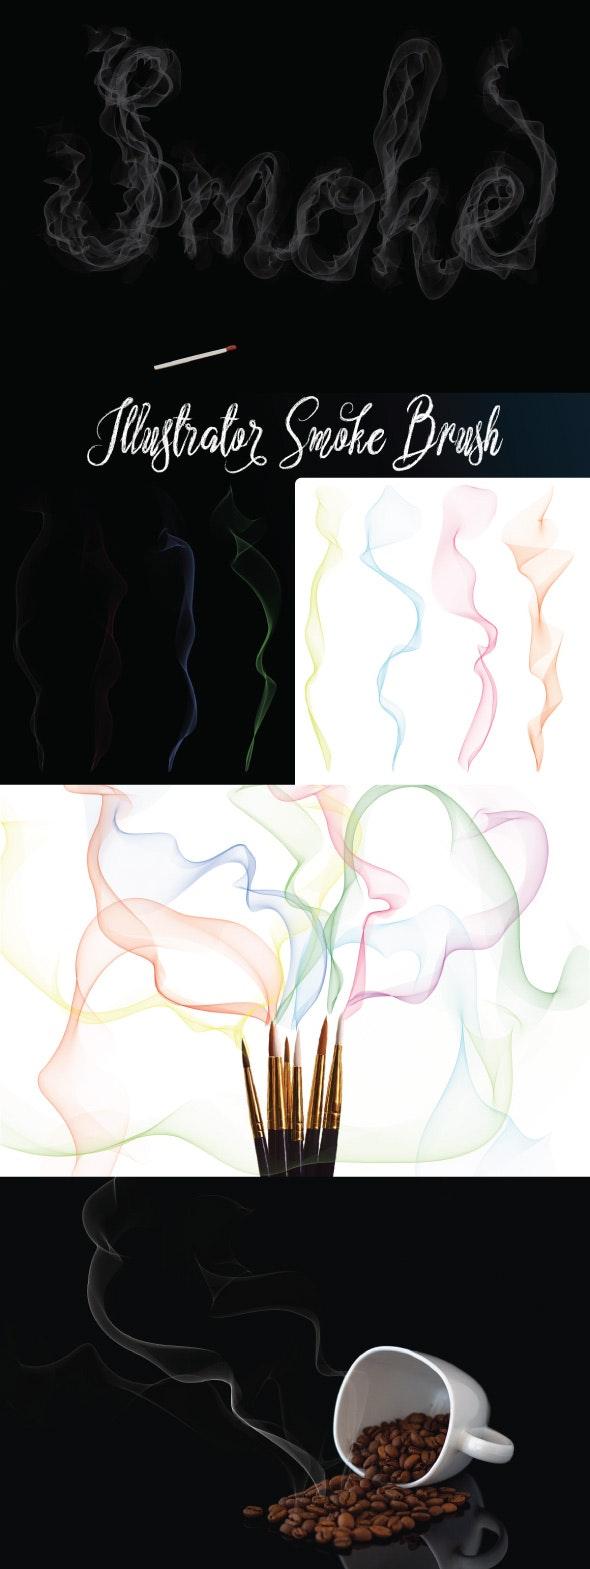 Illustrator Smoke Brush - Abstract Brushes